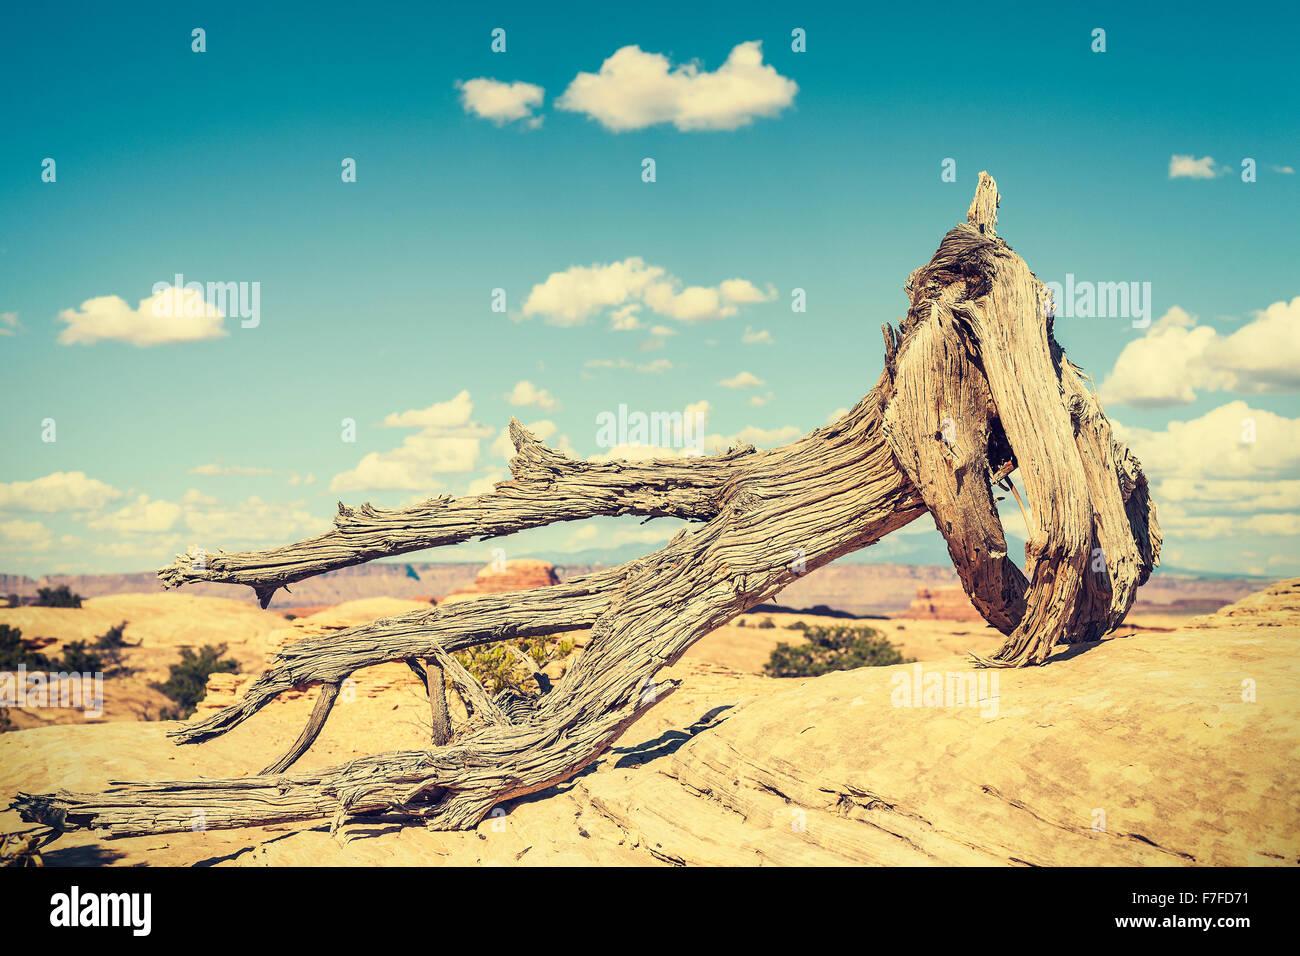 Retro getönten toten Baum, Klima Konzept Grafik ändern. Stockbild